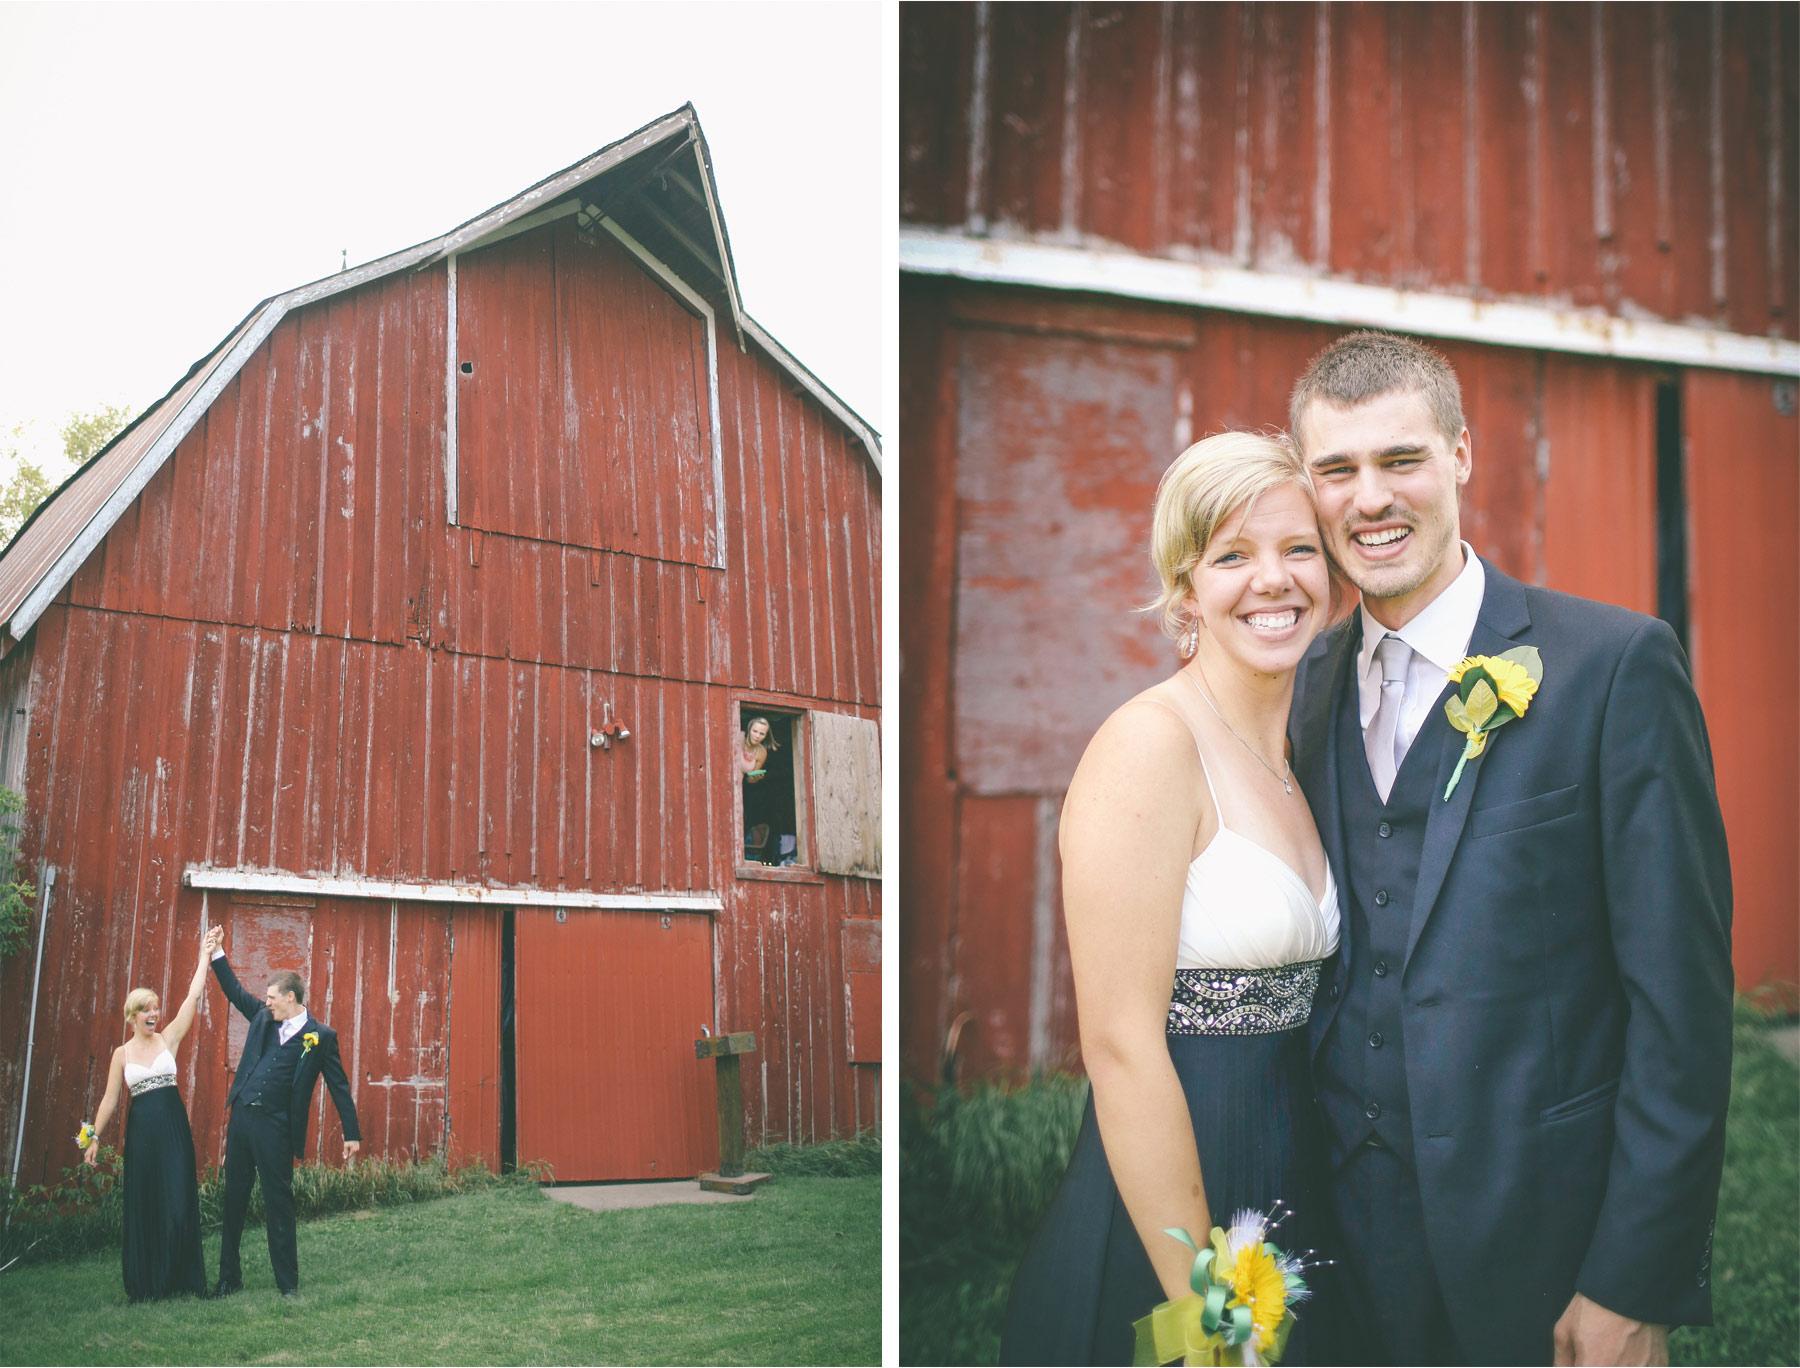 19-Vick-Photography-Proposal-Session-Engagement-Family-Farm-Barn-Barn-Kasie-and-Josh.jpg